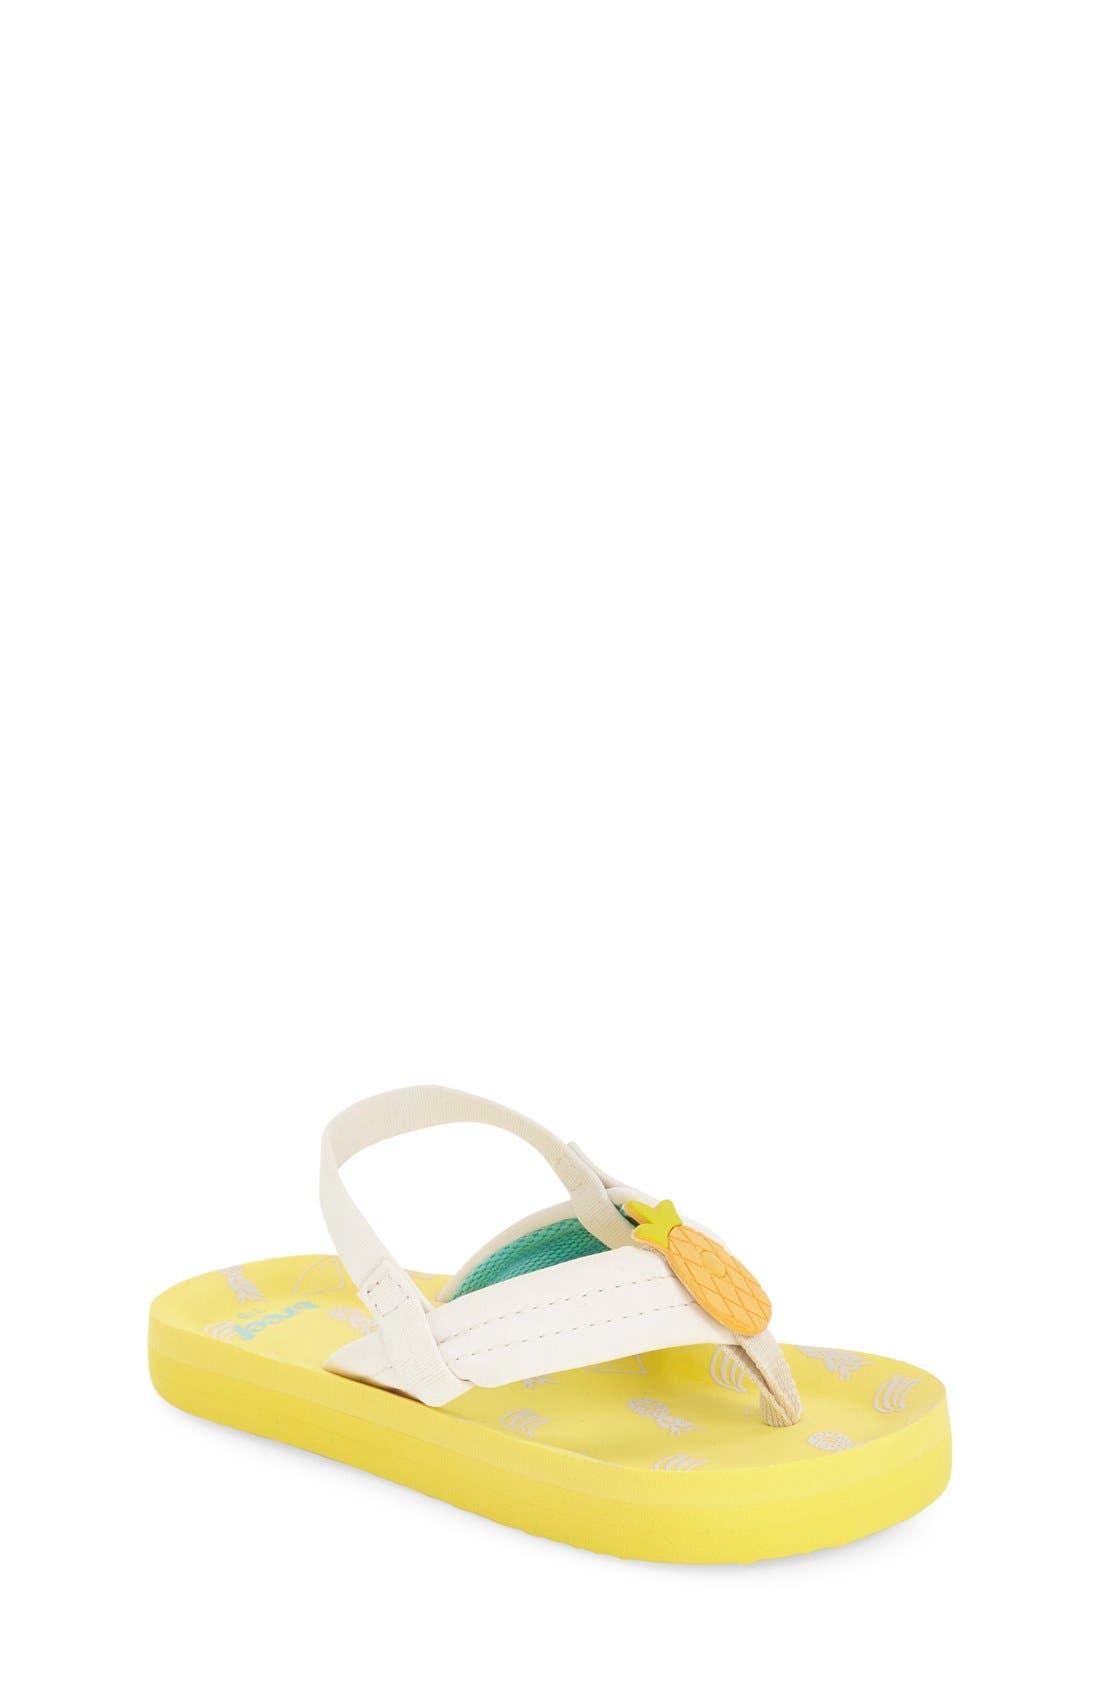 'Little Ahi' Thong Sandal,                             Alternate thumbnail 42, color,